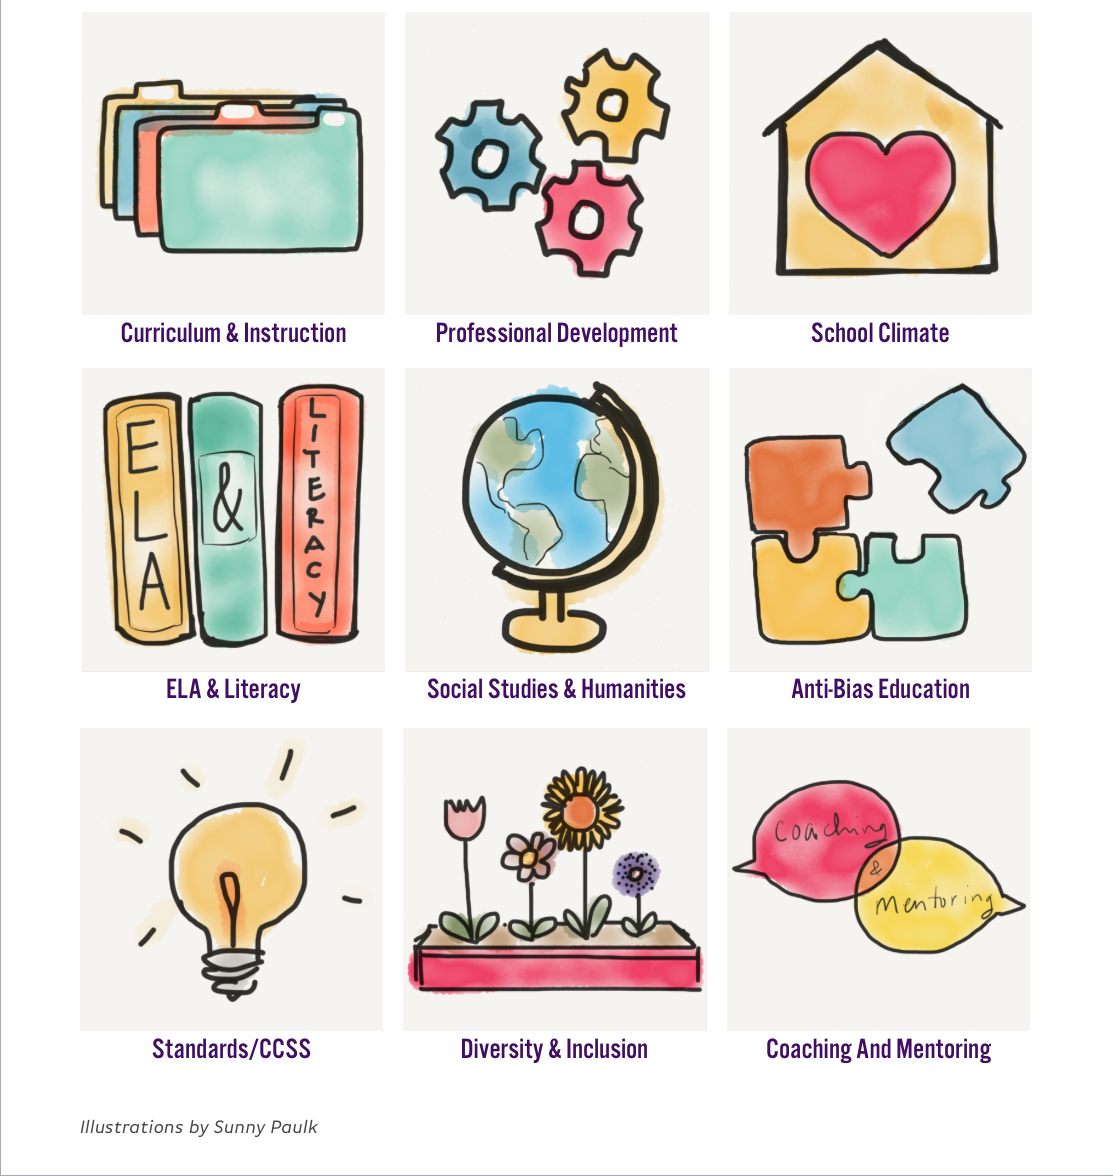 Chiariello Consulting website bucket illustrations, 2015.